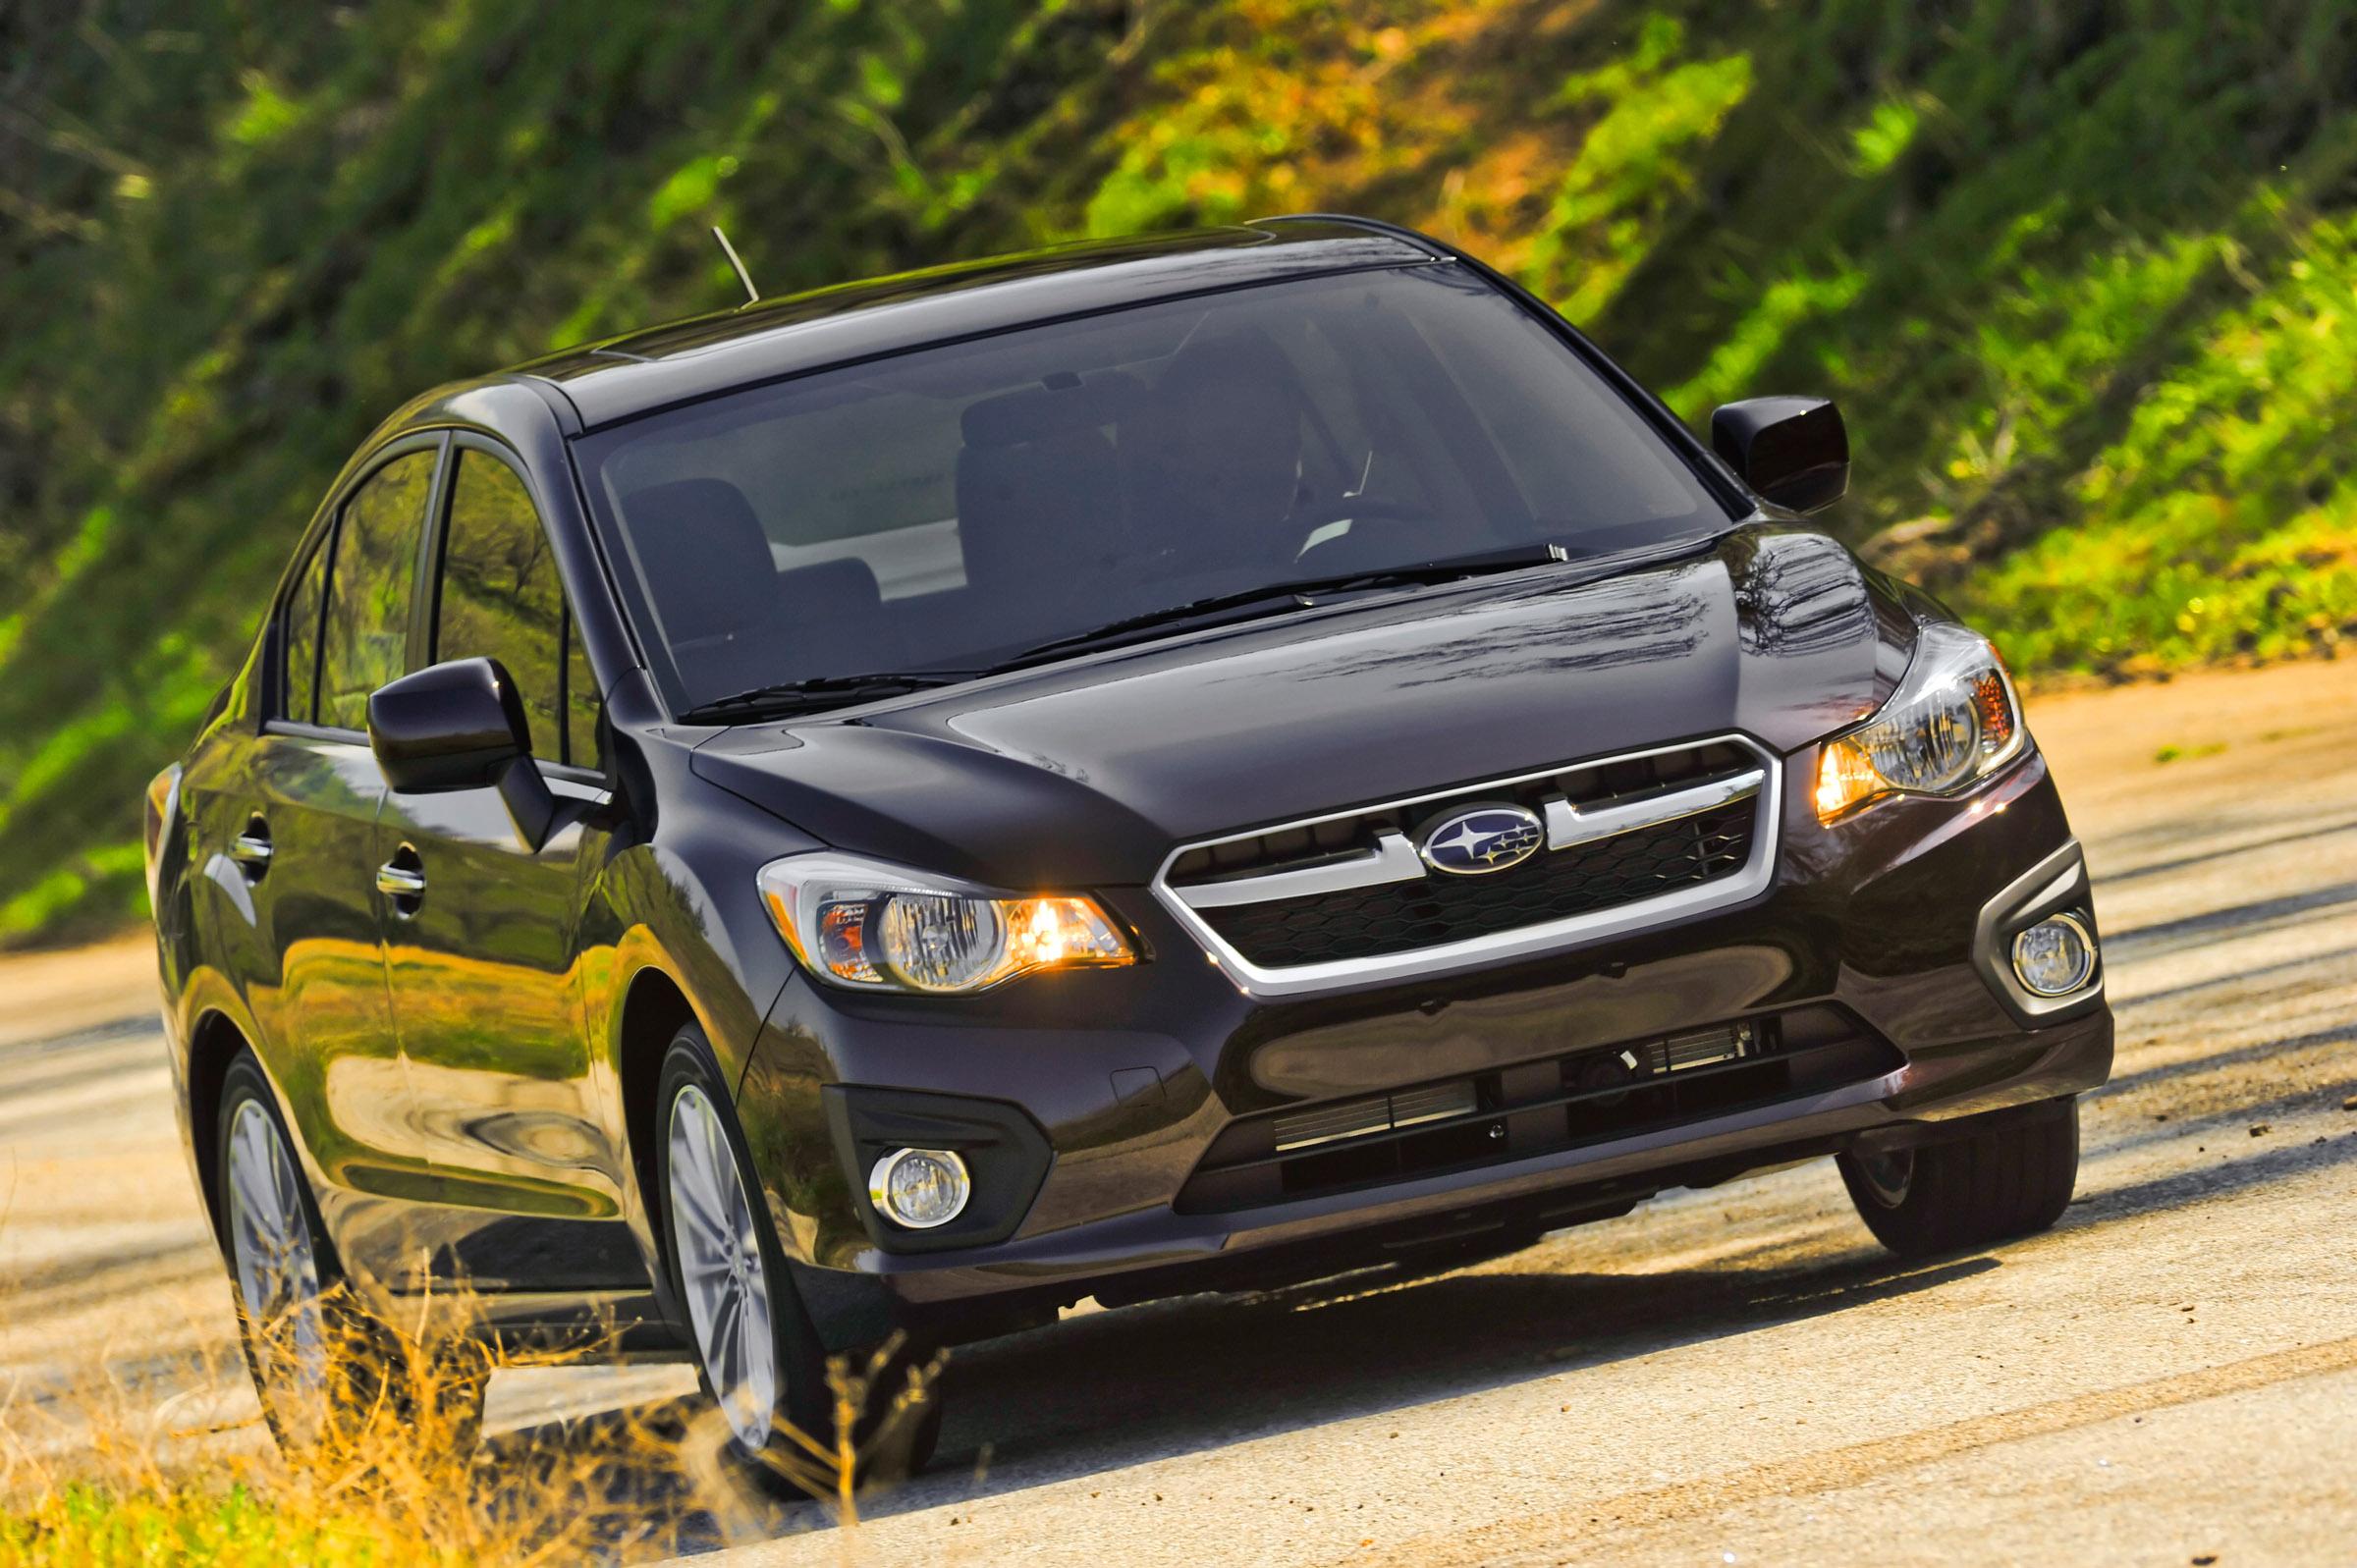 2012 - Subaru Impreza 2-0i лимитированная четвертая версия (фотографии) - фотография №9